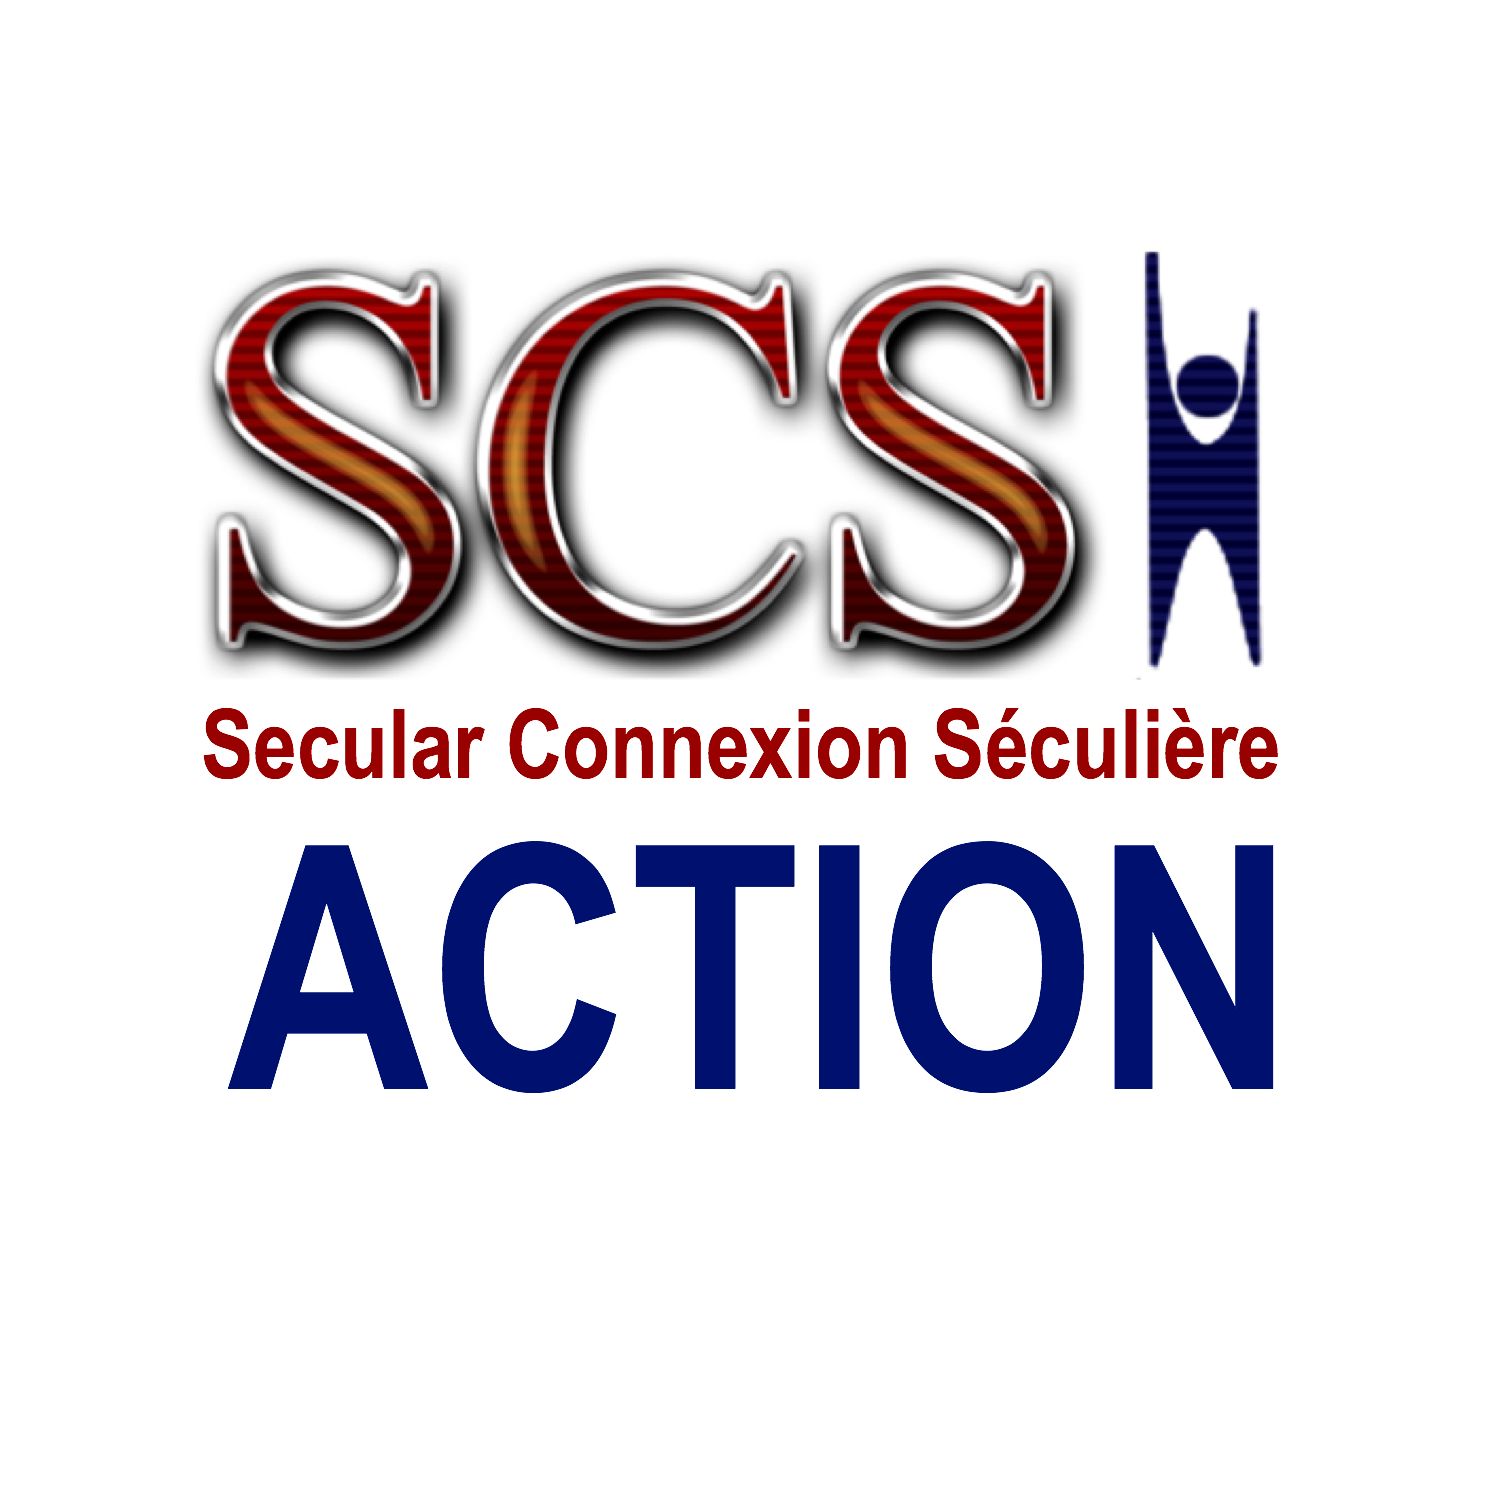 Support Scs Action Scs Nexus La Connexion Scs